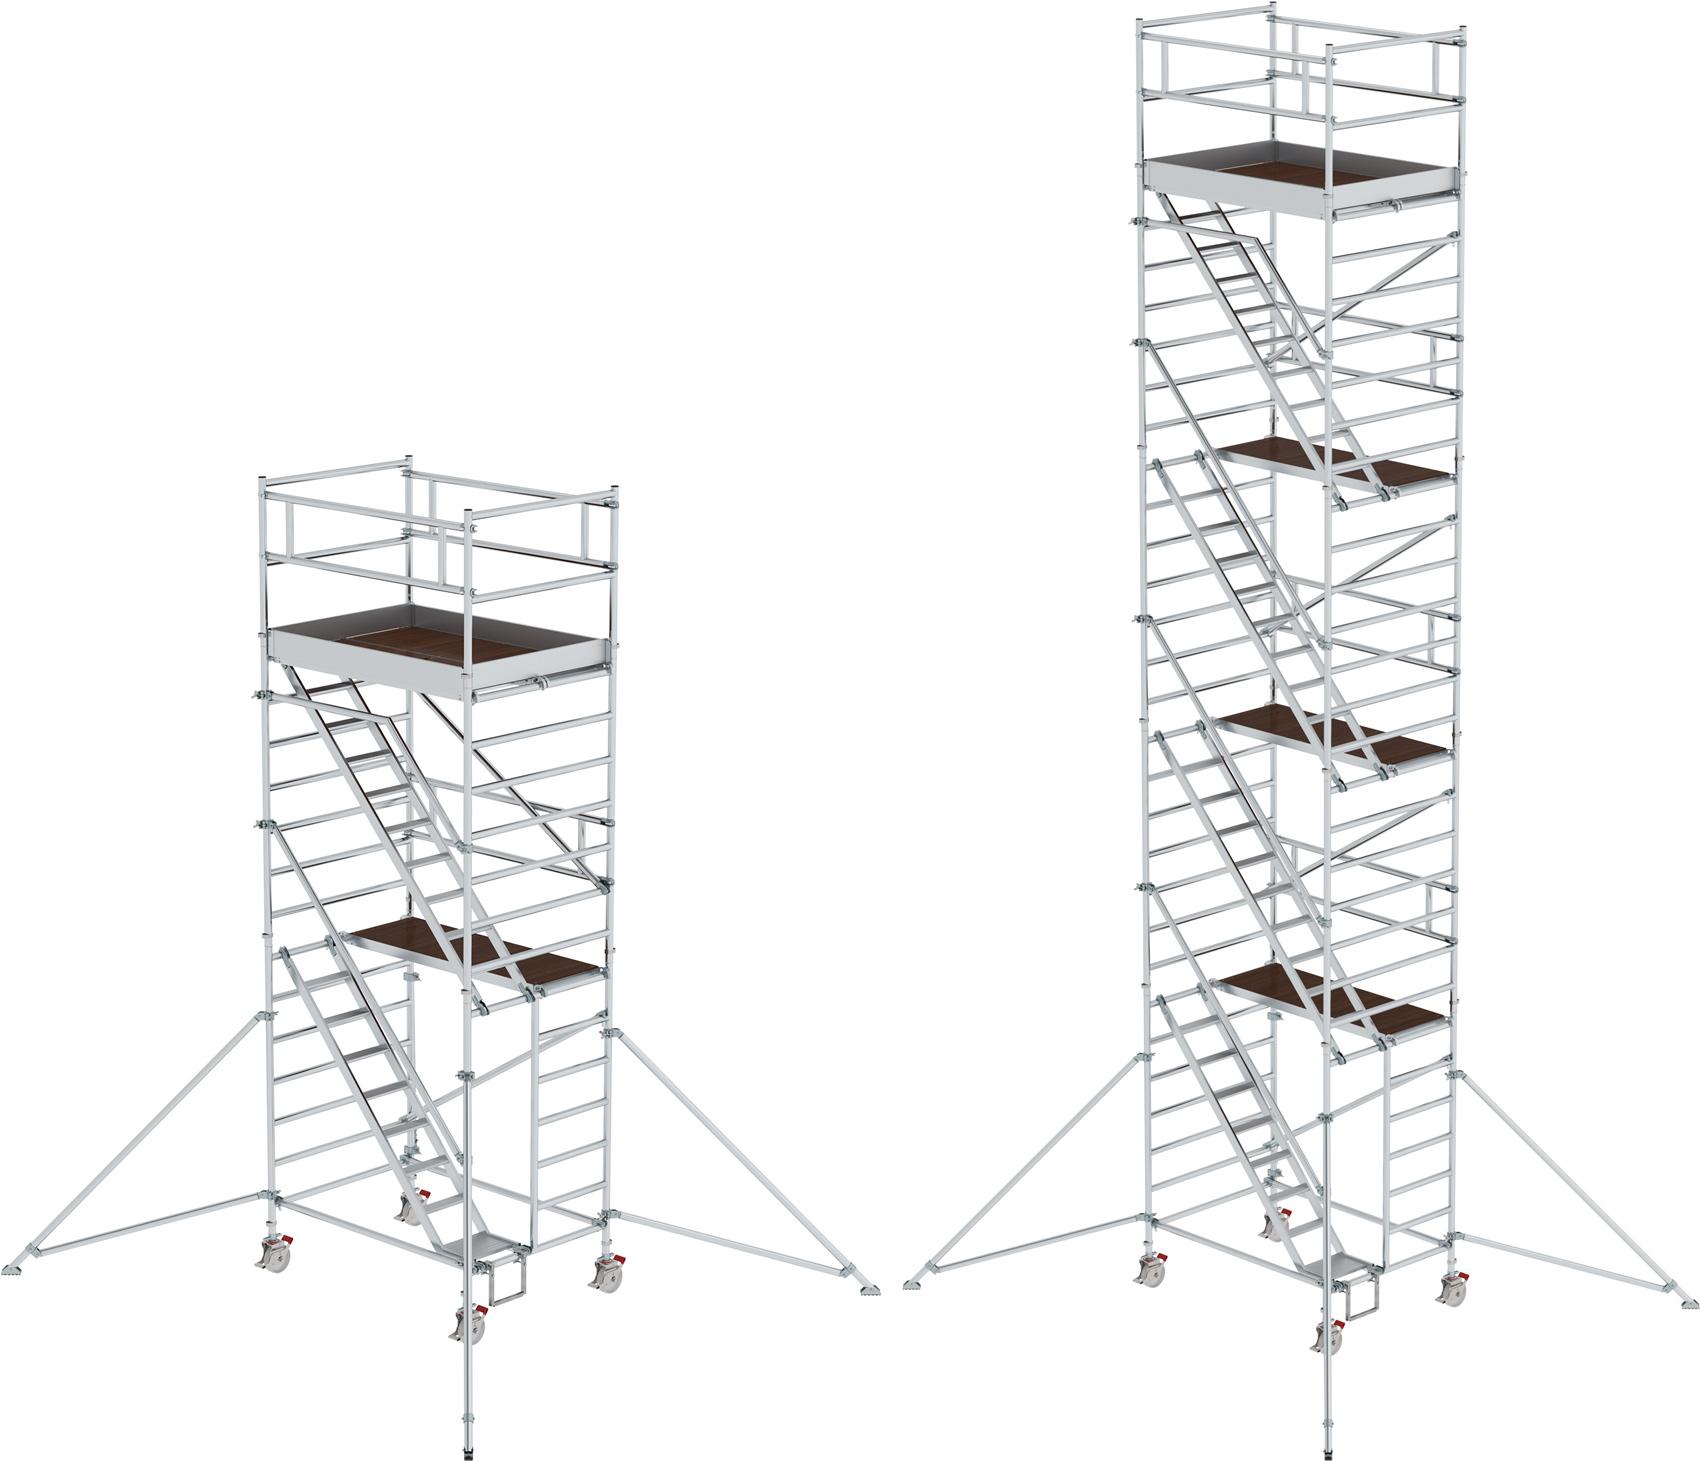 Treppengerüst Günzburger 1,80 x 1,35 m